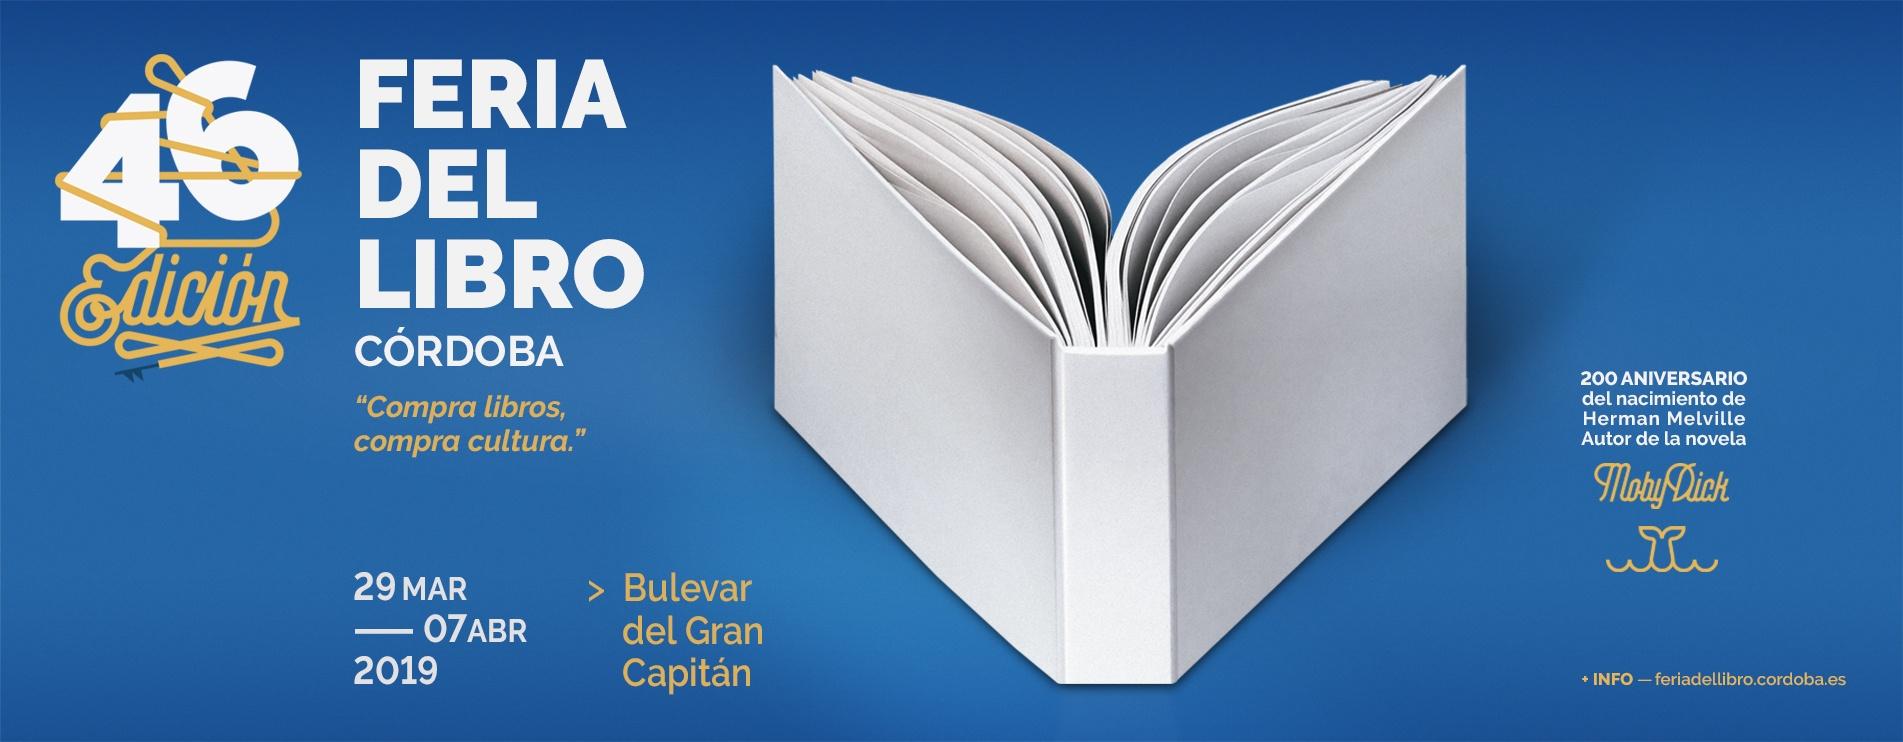 46 Feria del Libro de Córdoba